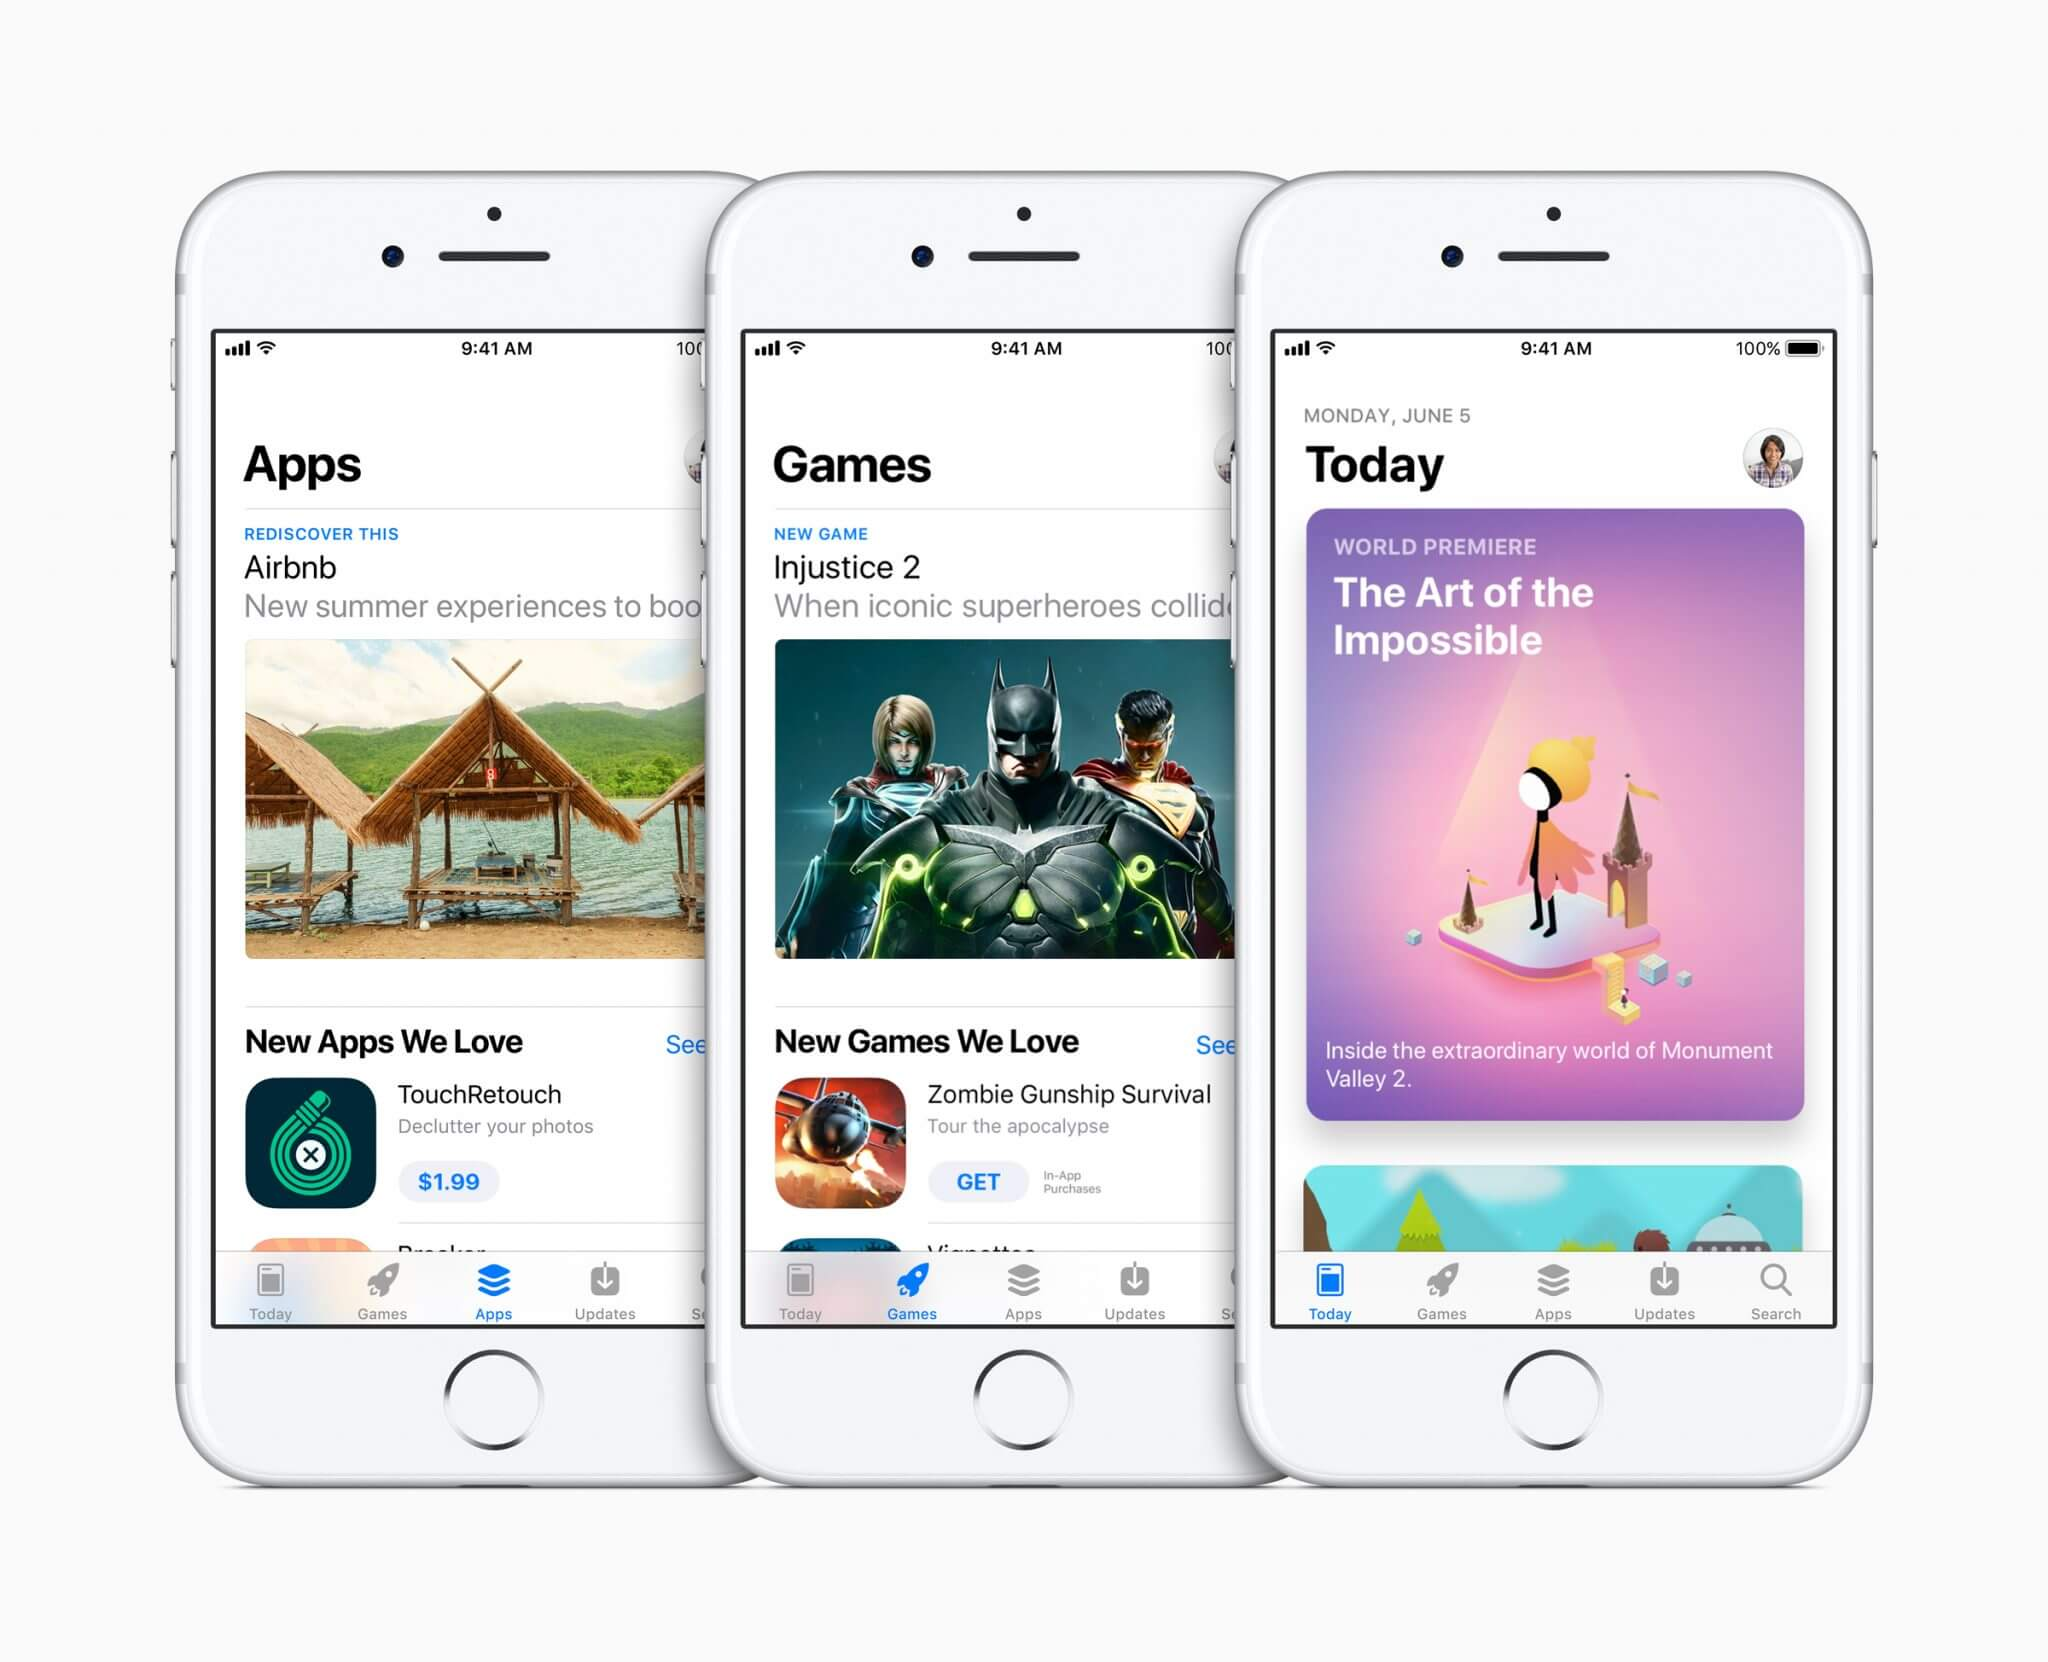 new app store three iphones apps games today - Oficial! Apple vai passar a cobrar em real compras feitas na App Store